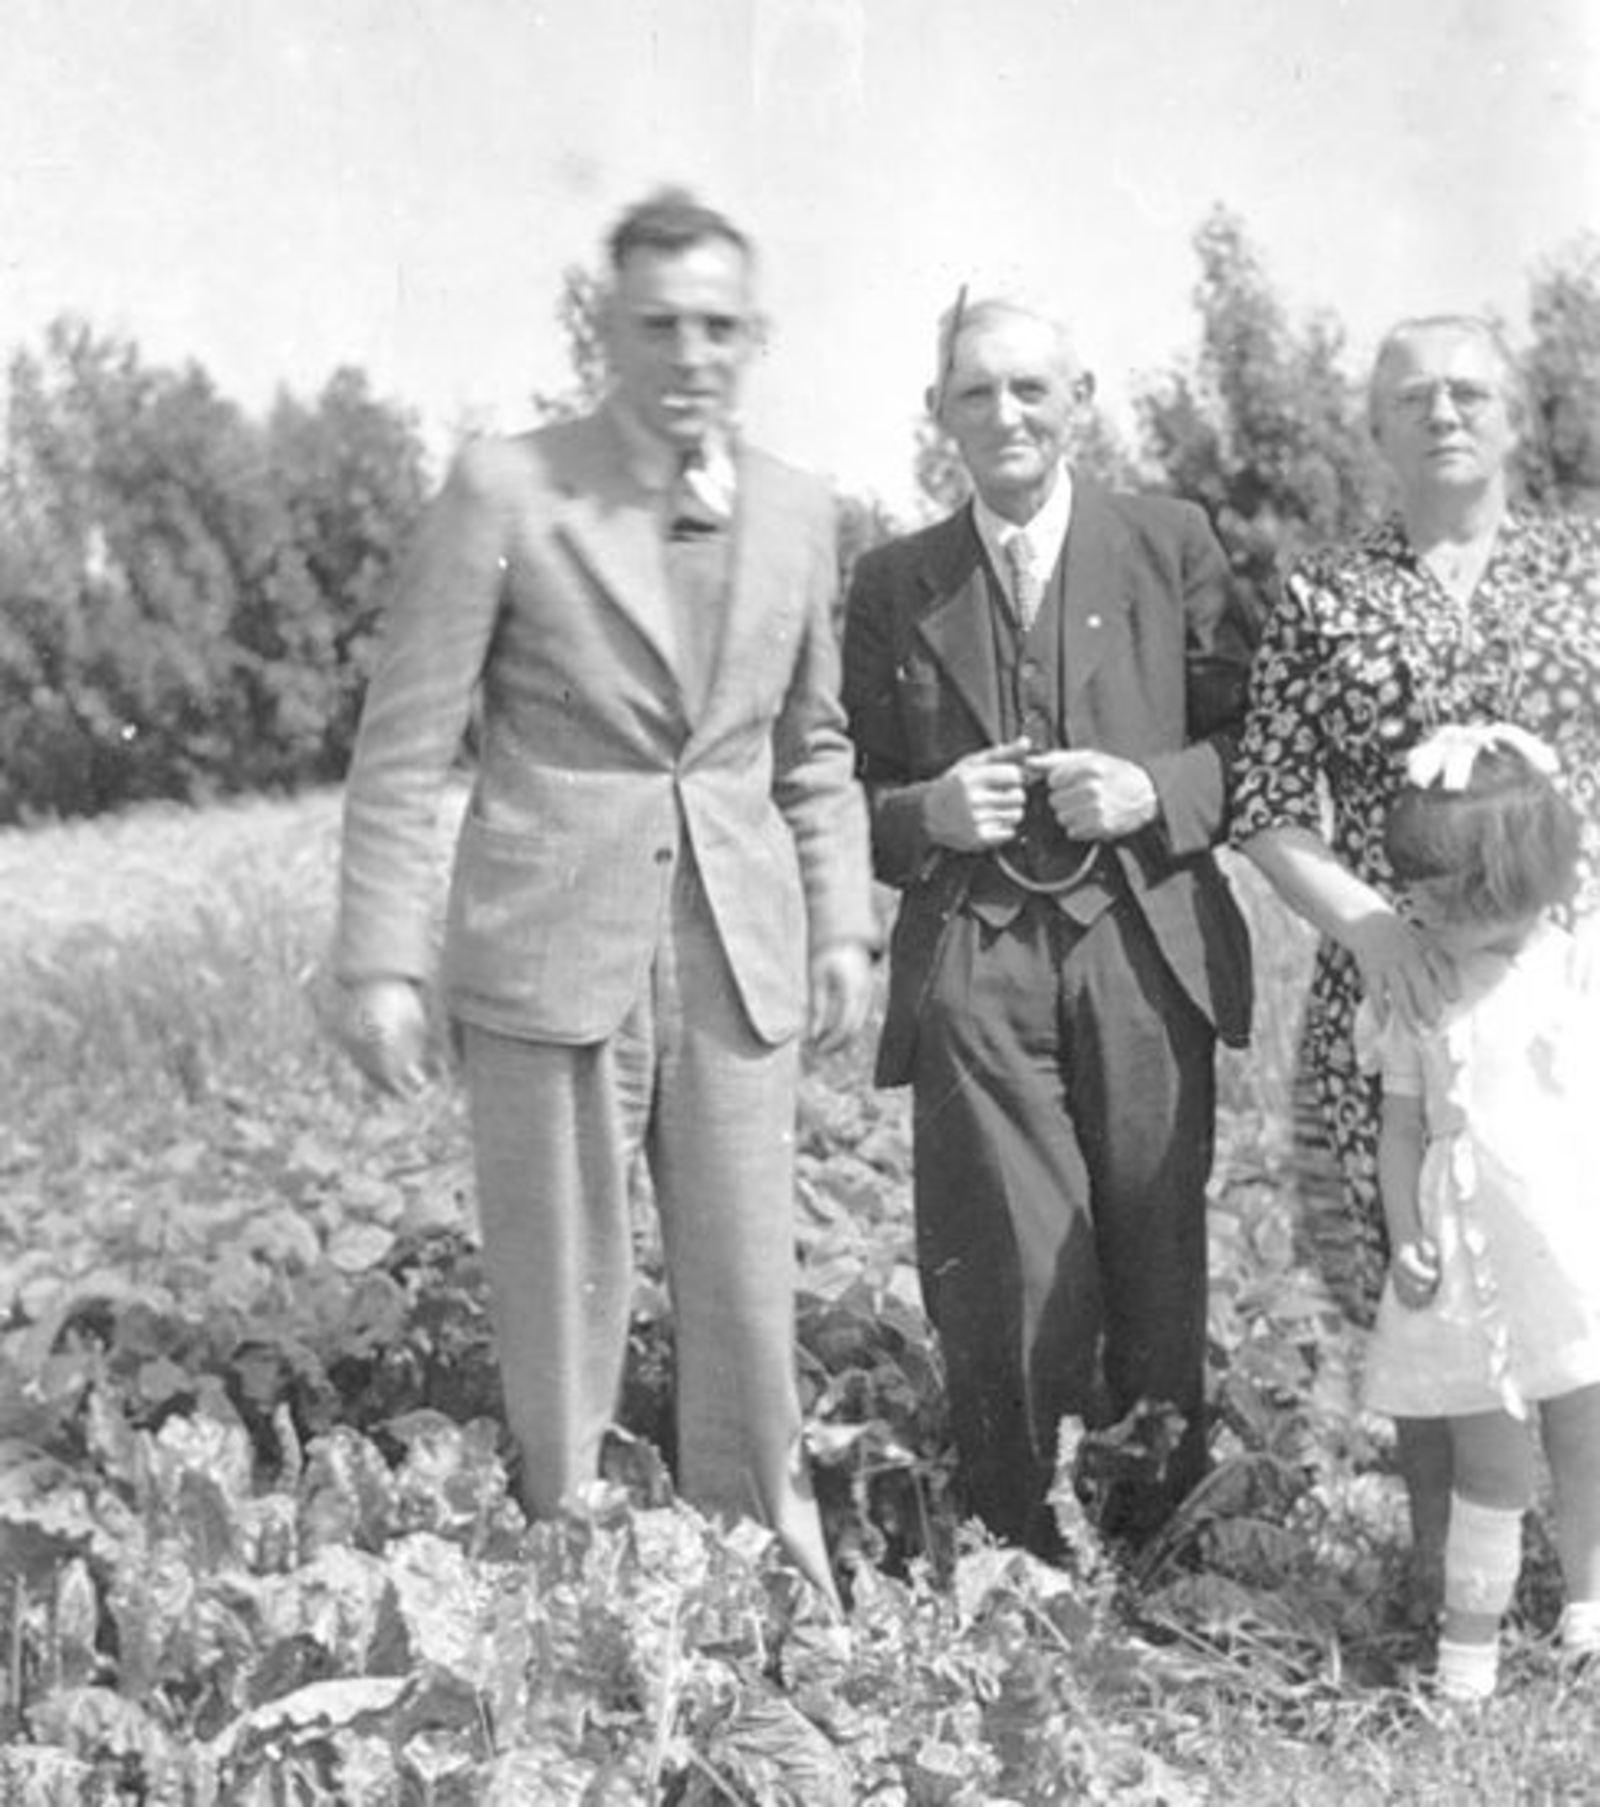 Groef Abraham vd 1882 19__ met Familie in Tuin 02